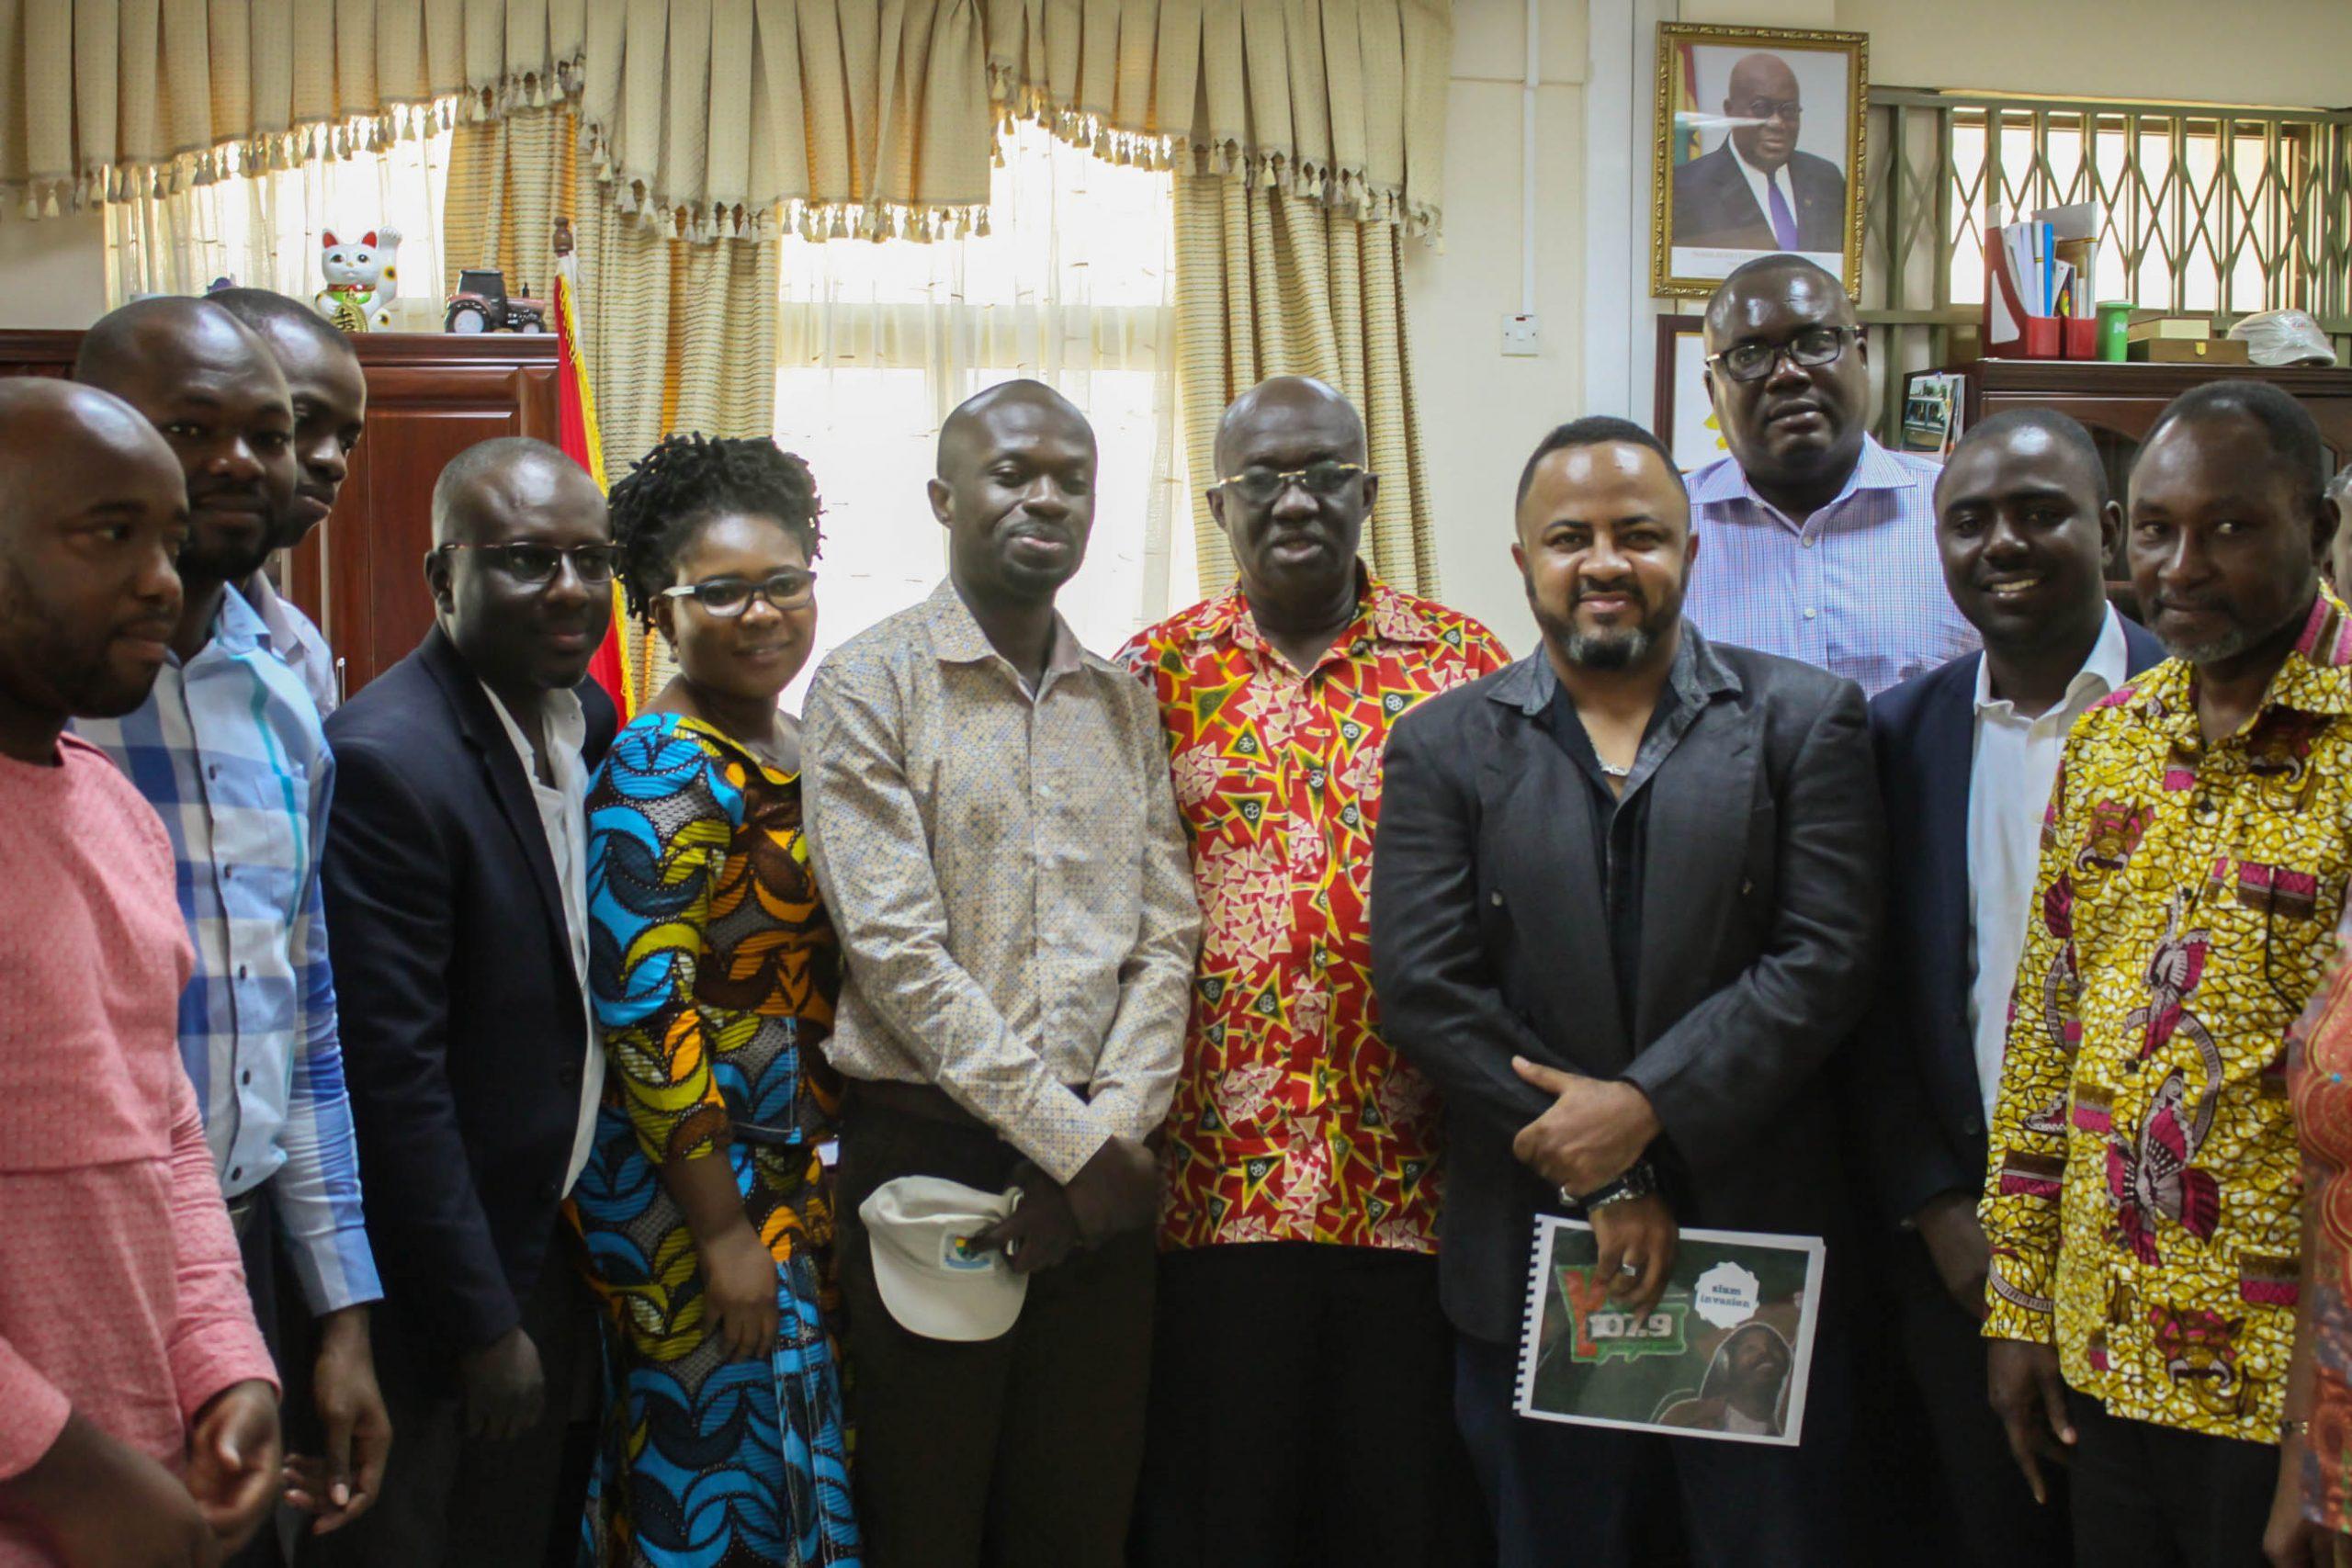 Sanitation Minister endorses YFM's Slum Invasion Campaign